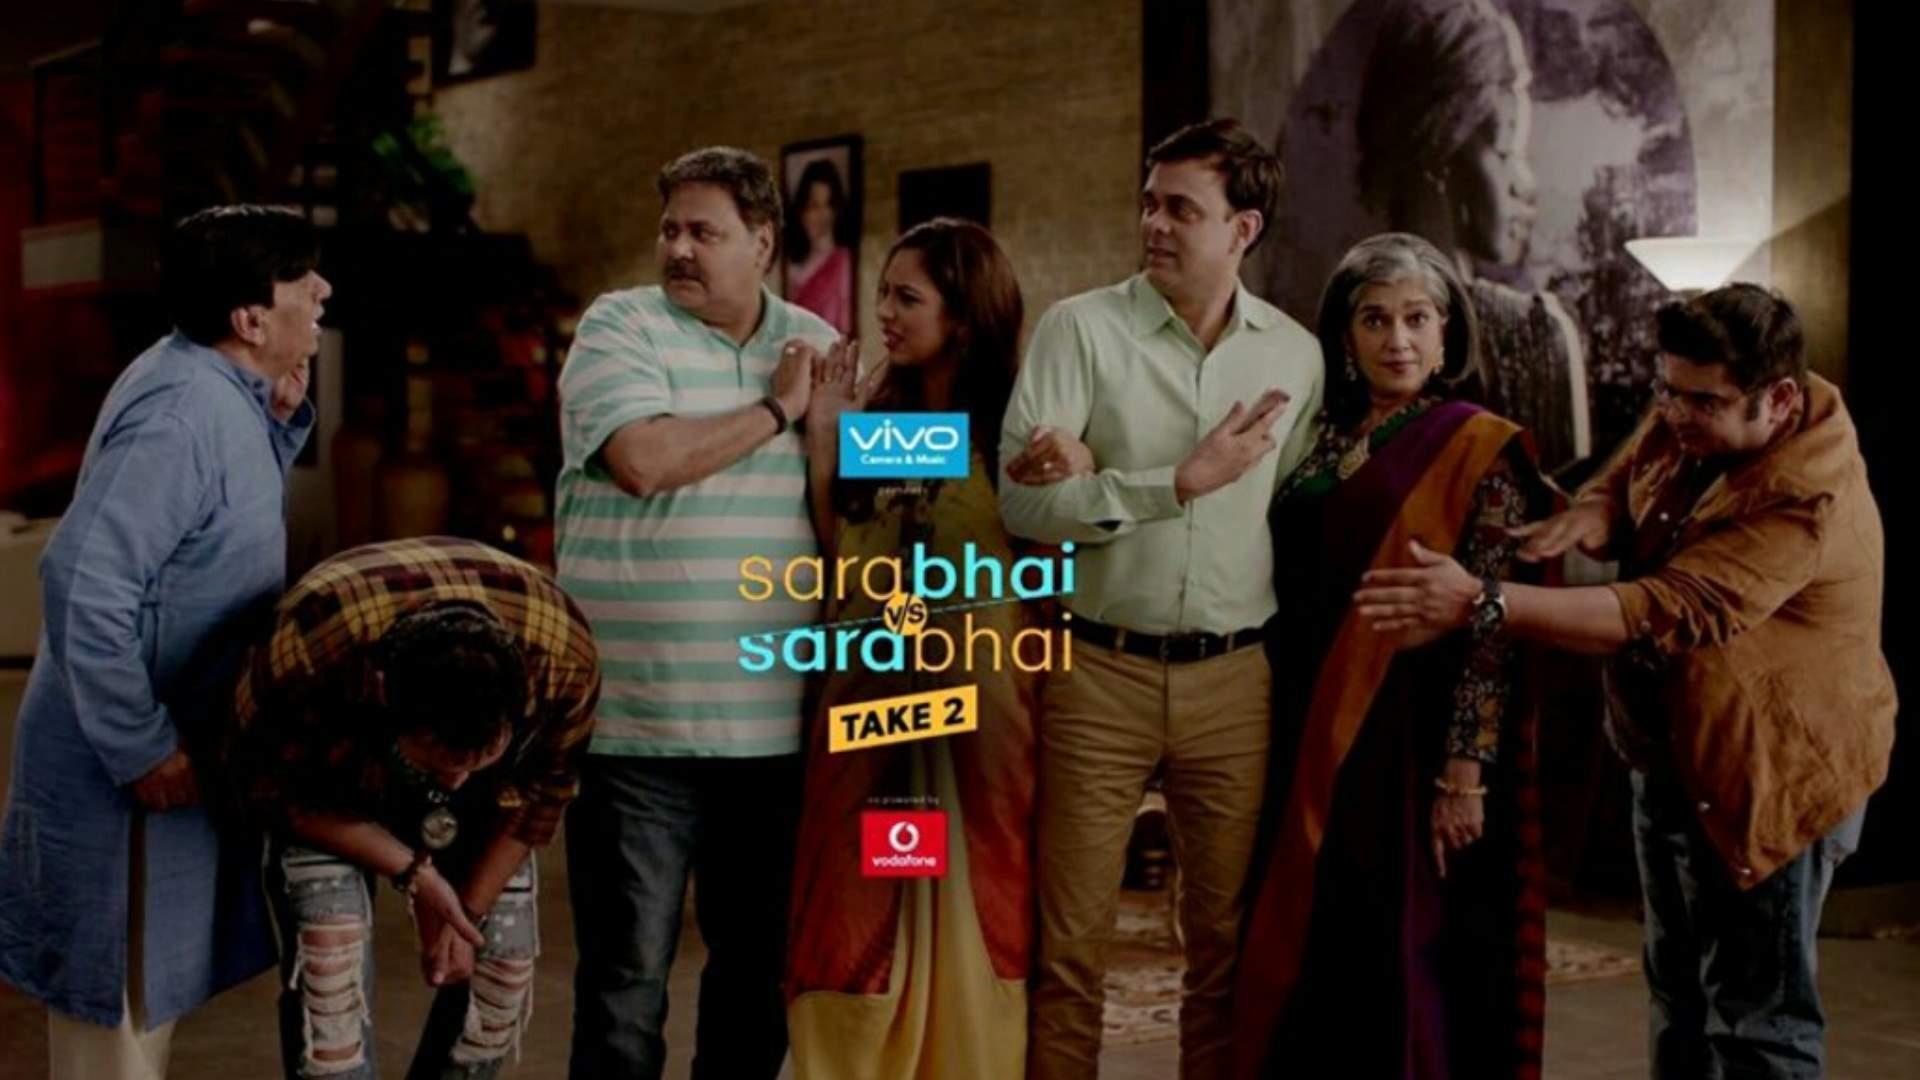 Sarabhai vs Sarabhai - Season 2 - Newest TV-episodes always on Putlocker